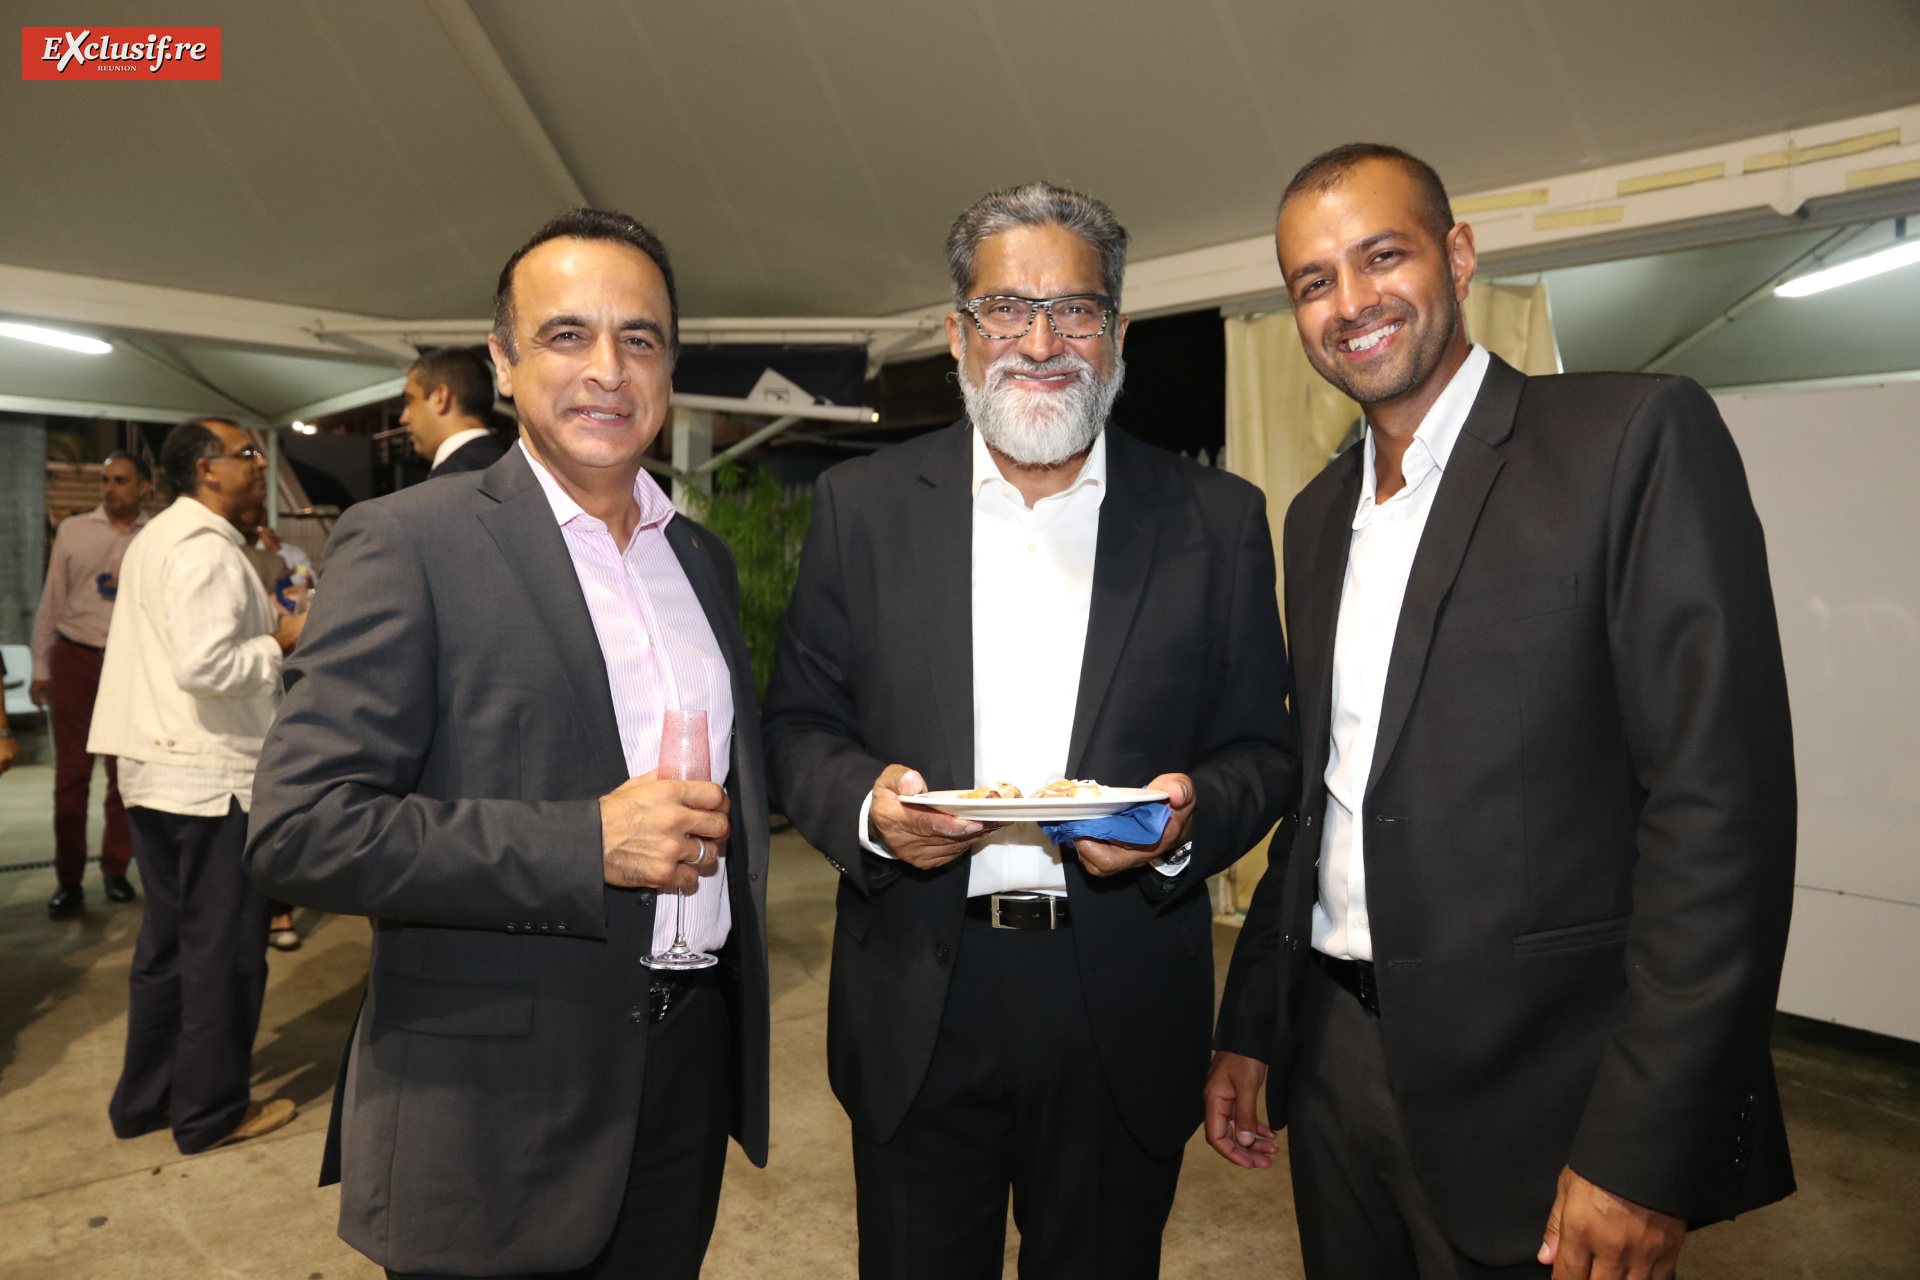 Ali Esmaël, Osman Ravate, et son fils Youcha